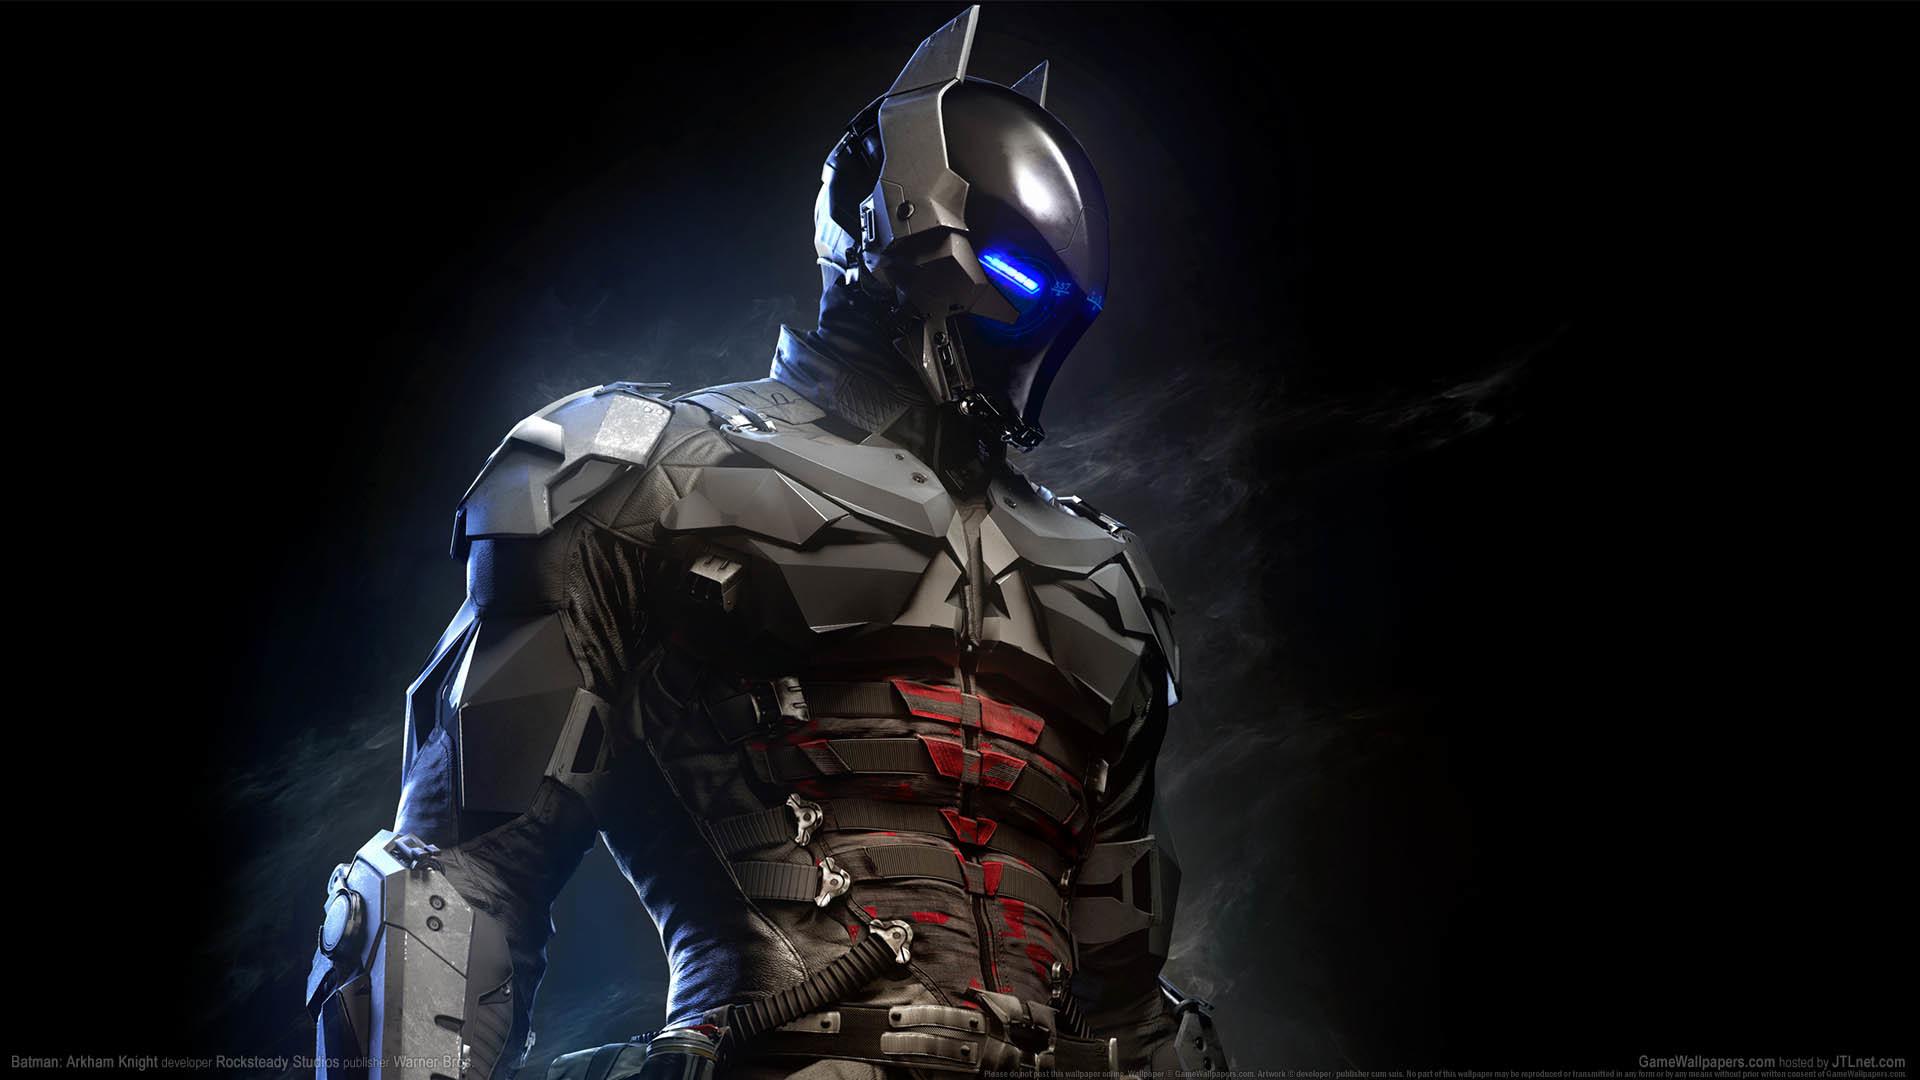 Batman Arkham Knight Wallpaper Arkham Knight by MinionMask on   Wallpapers  4k   Pinterest   Batman arkham knight, Arkham knight and Batman arkham